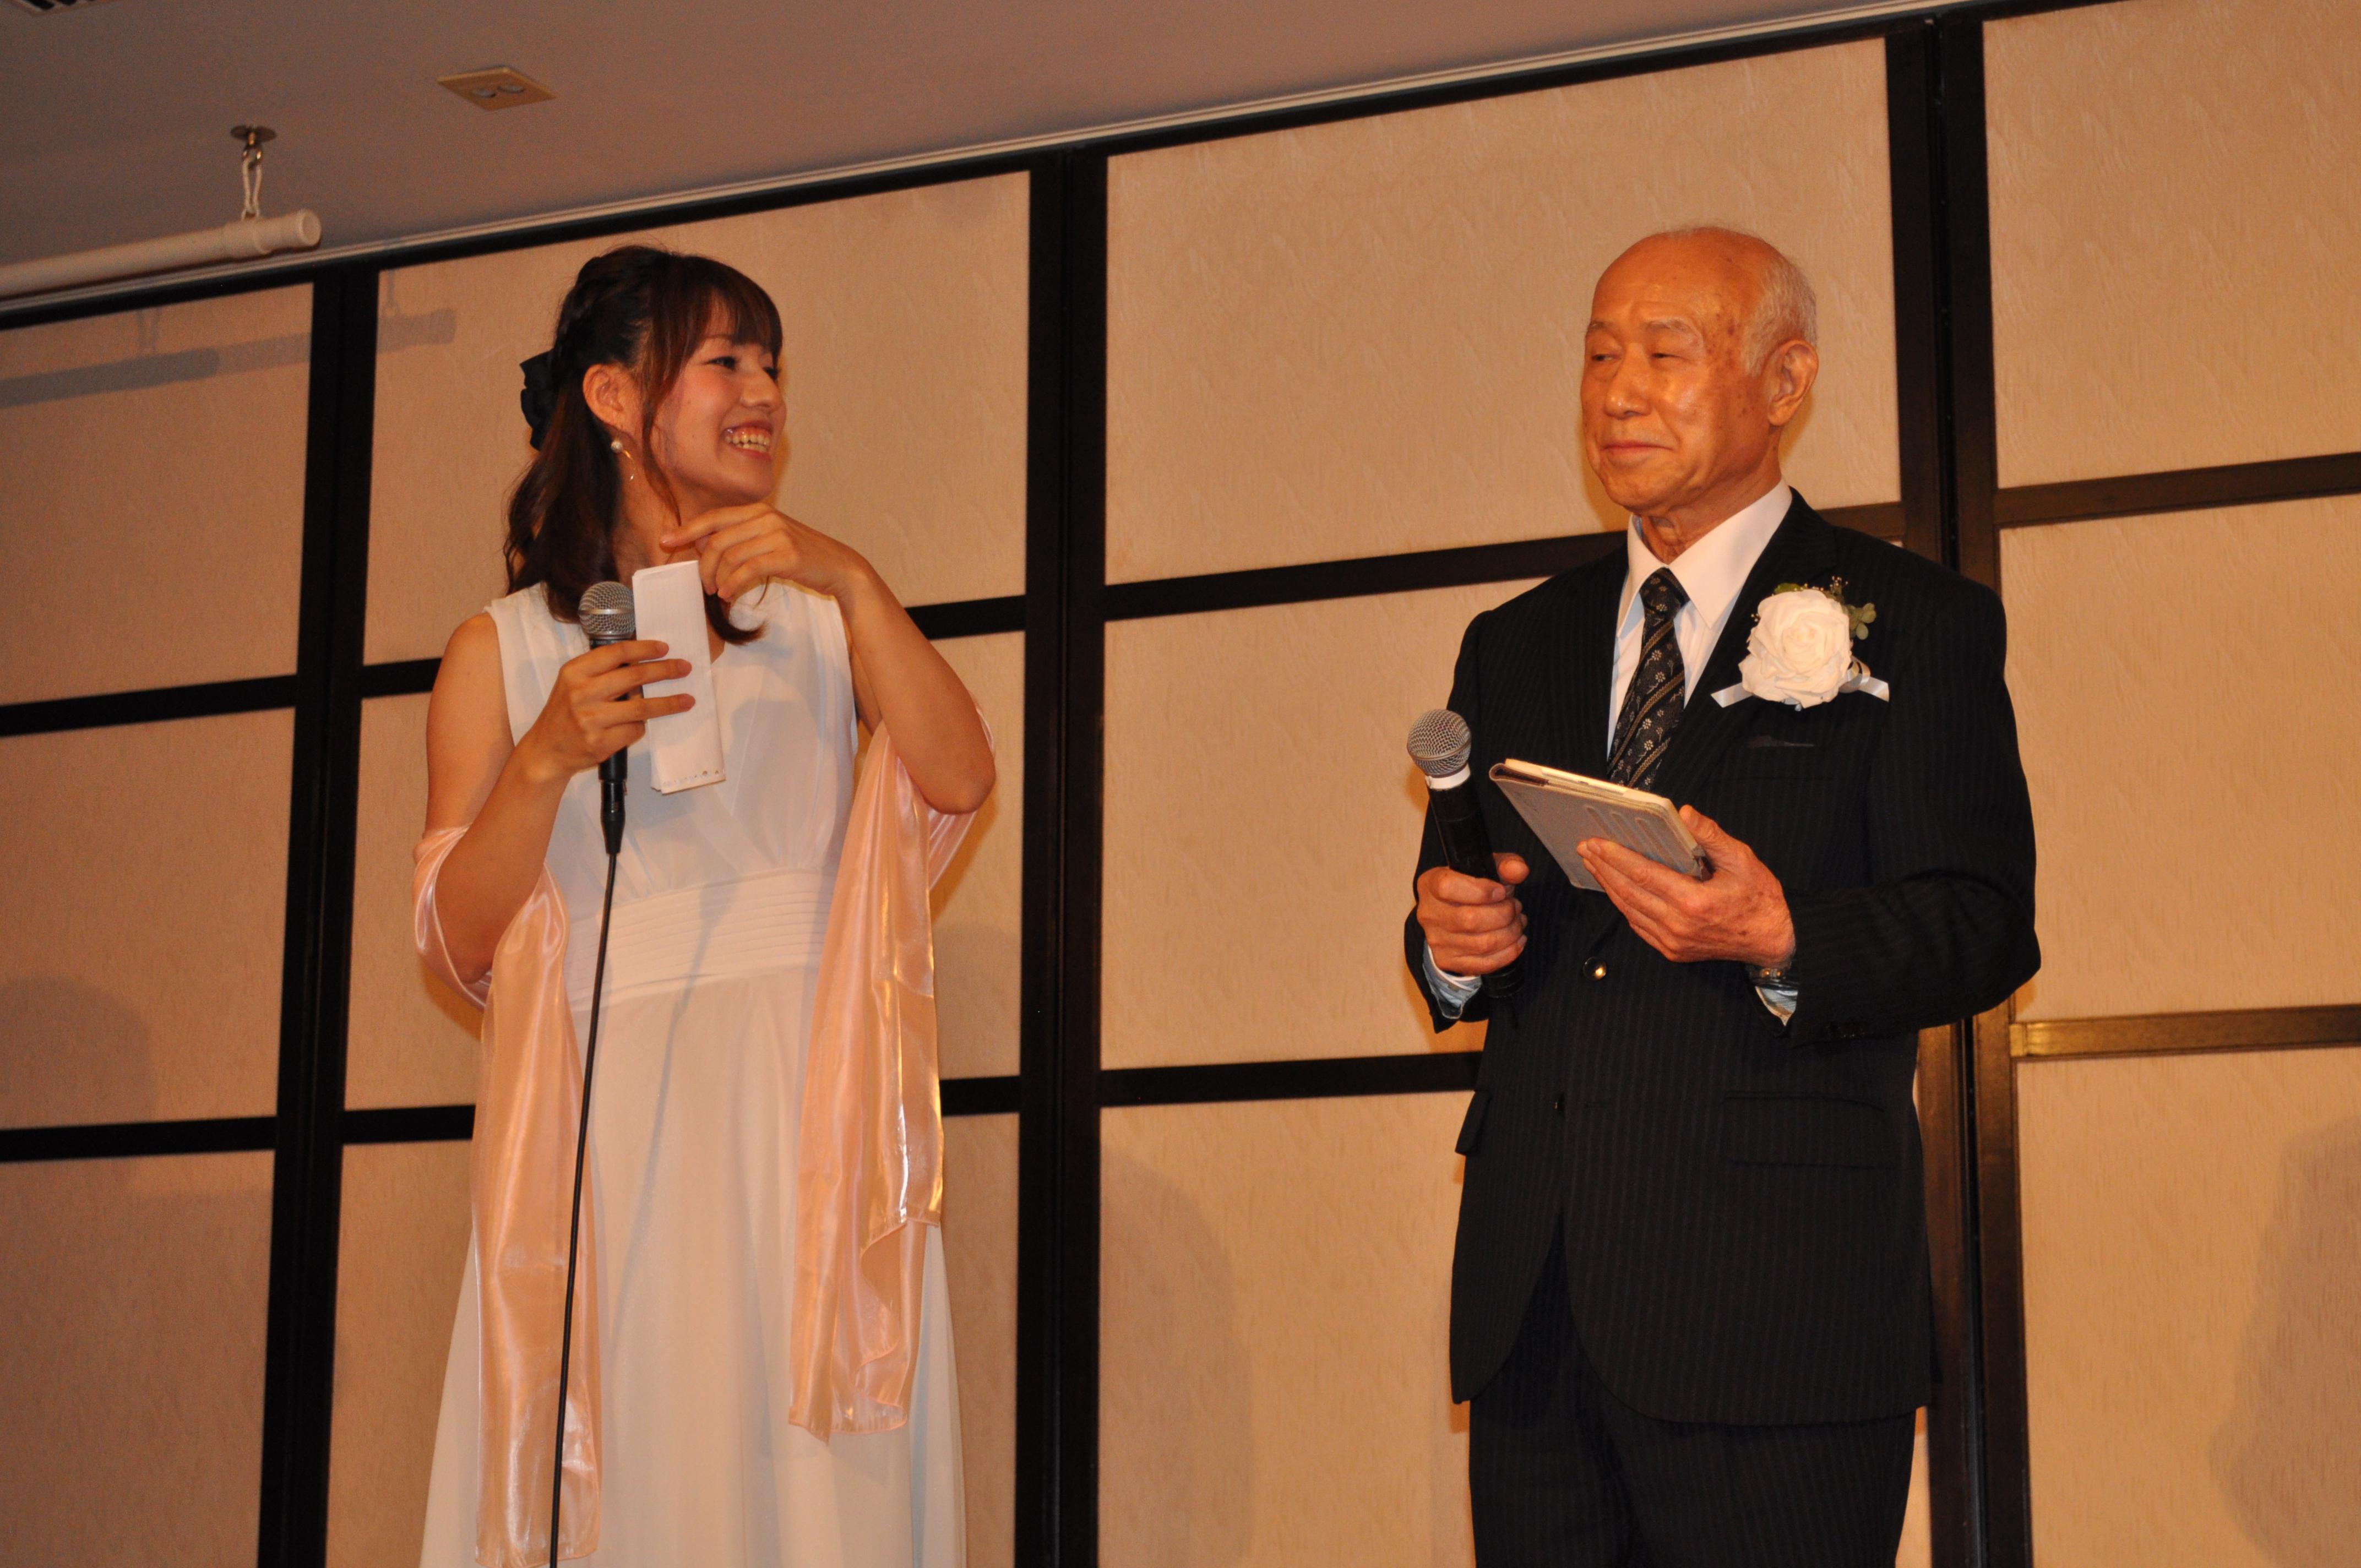 DSC 0510 - 第6回思風会全国大会2018in東京開催